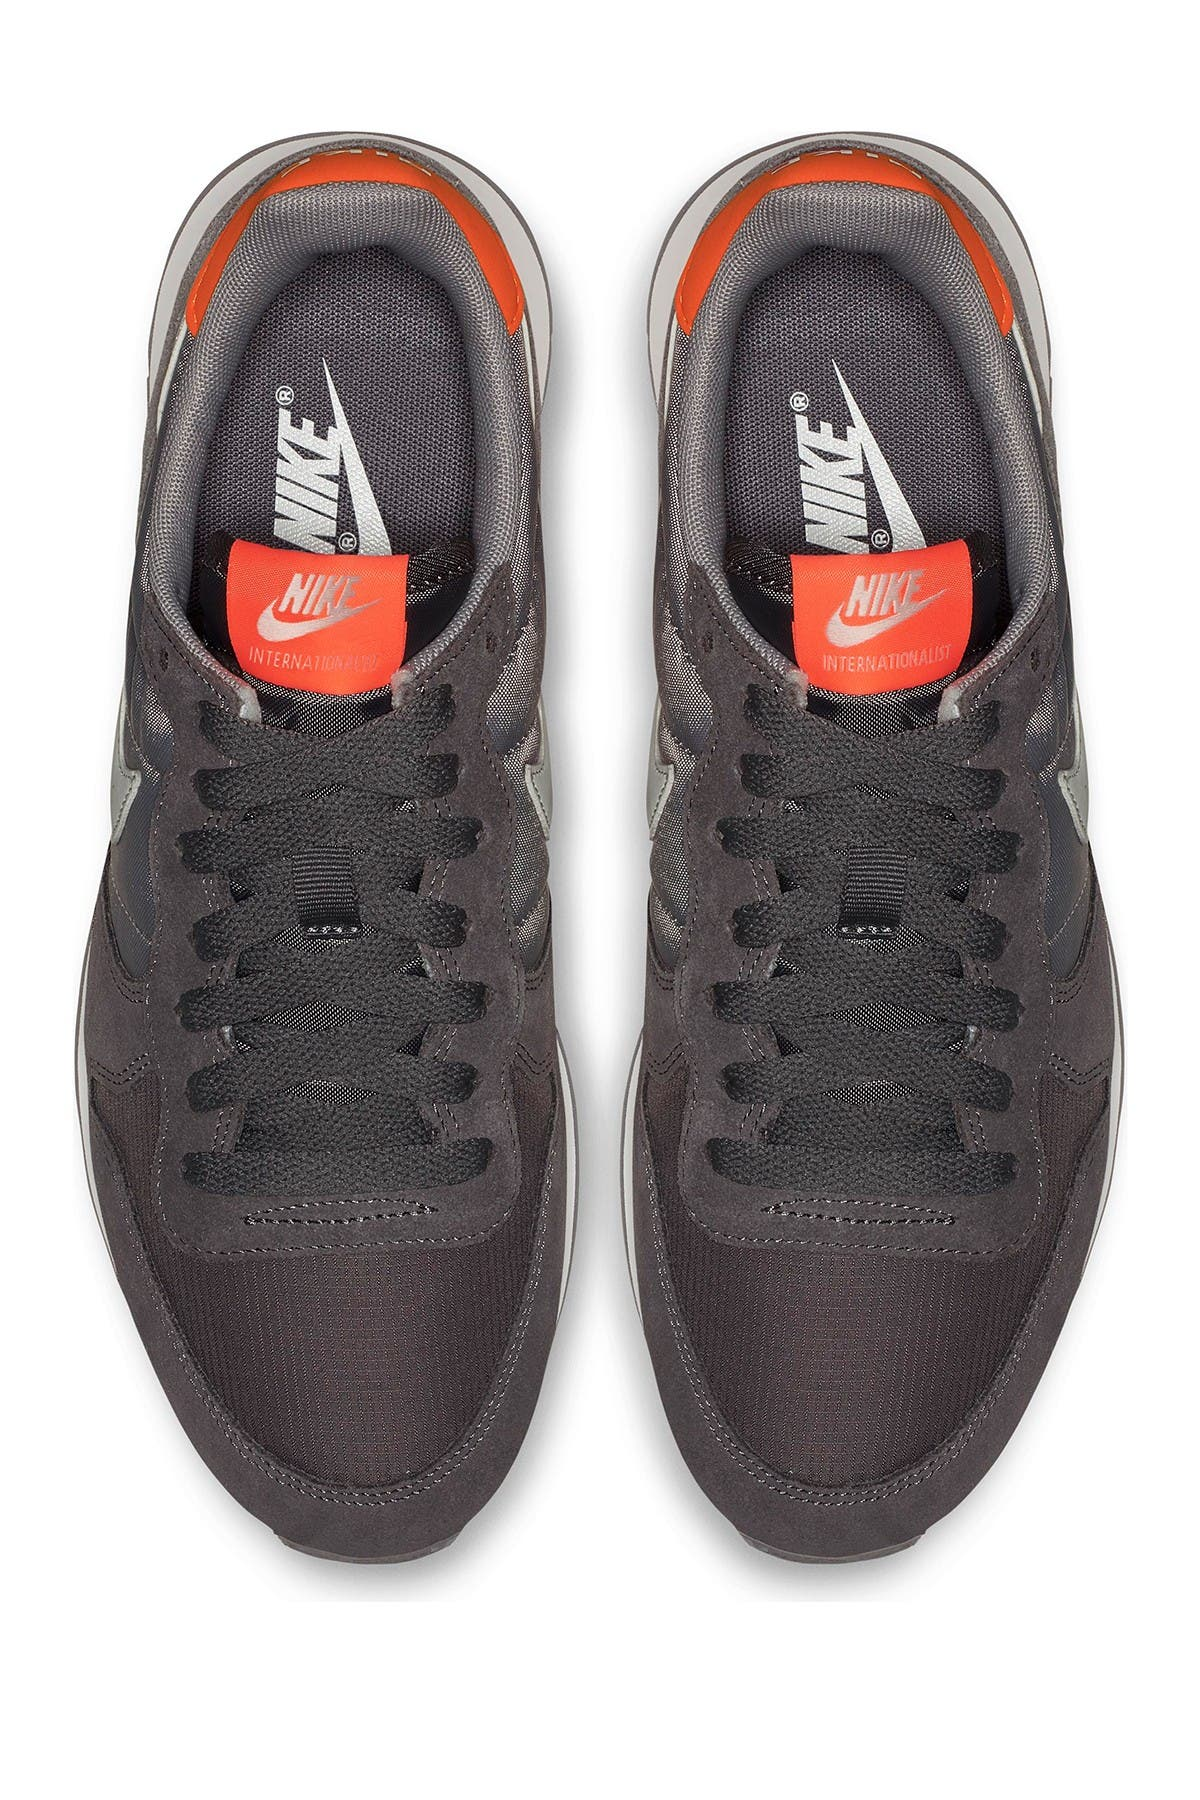 Nike | Internationalist Running Sneaker